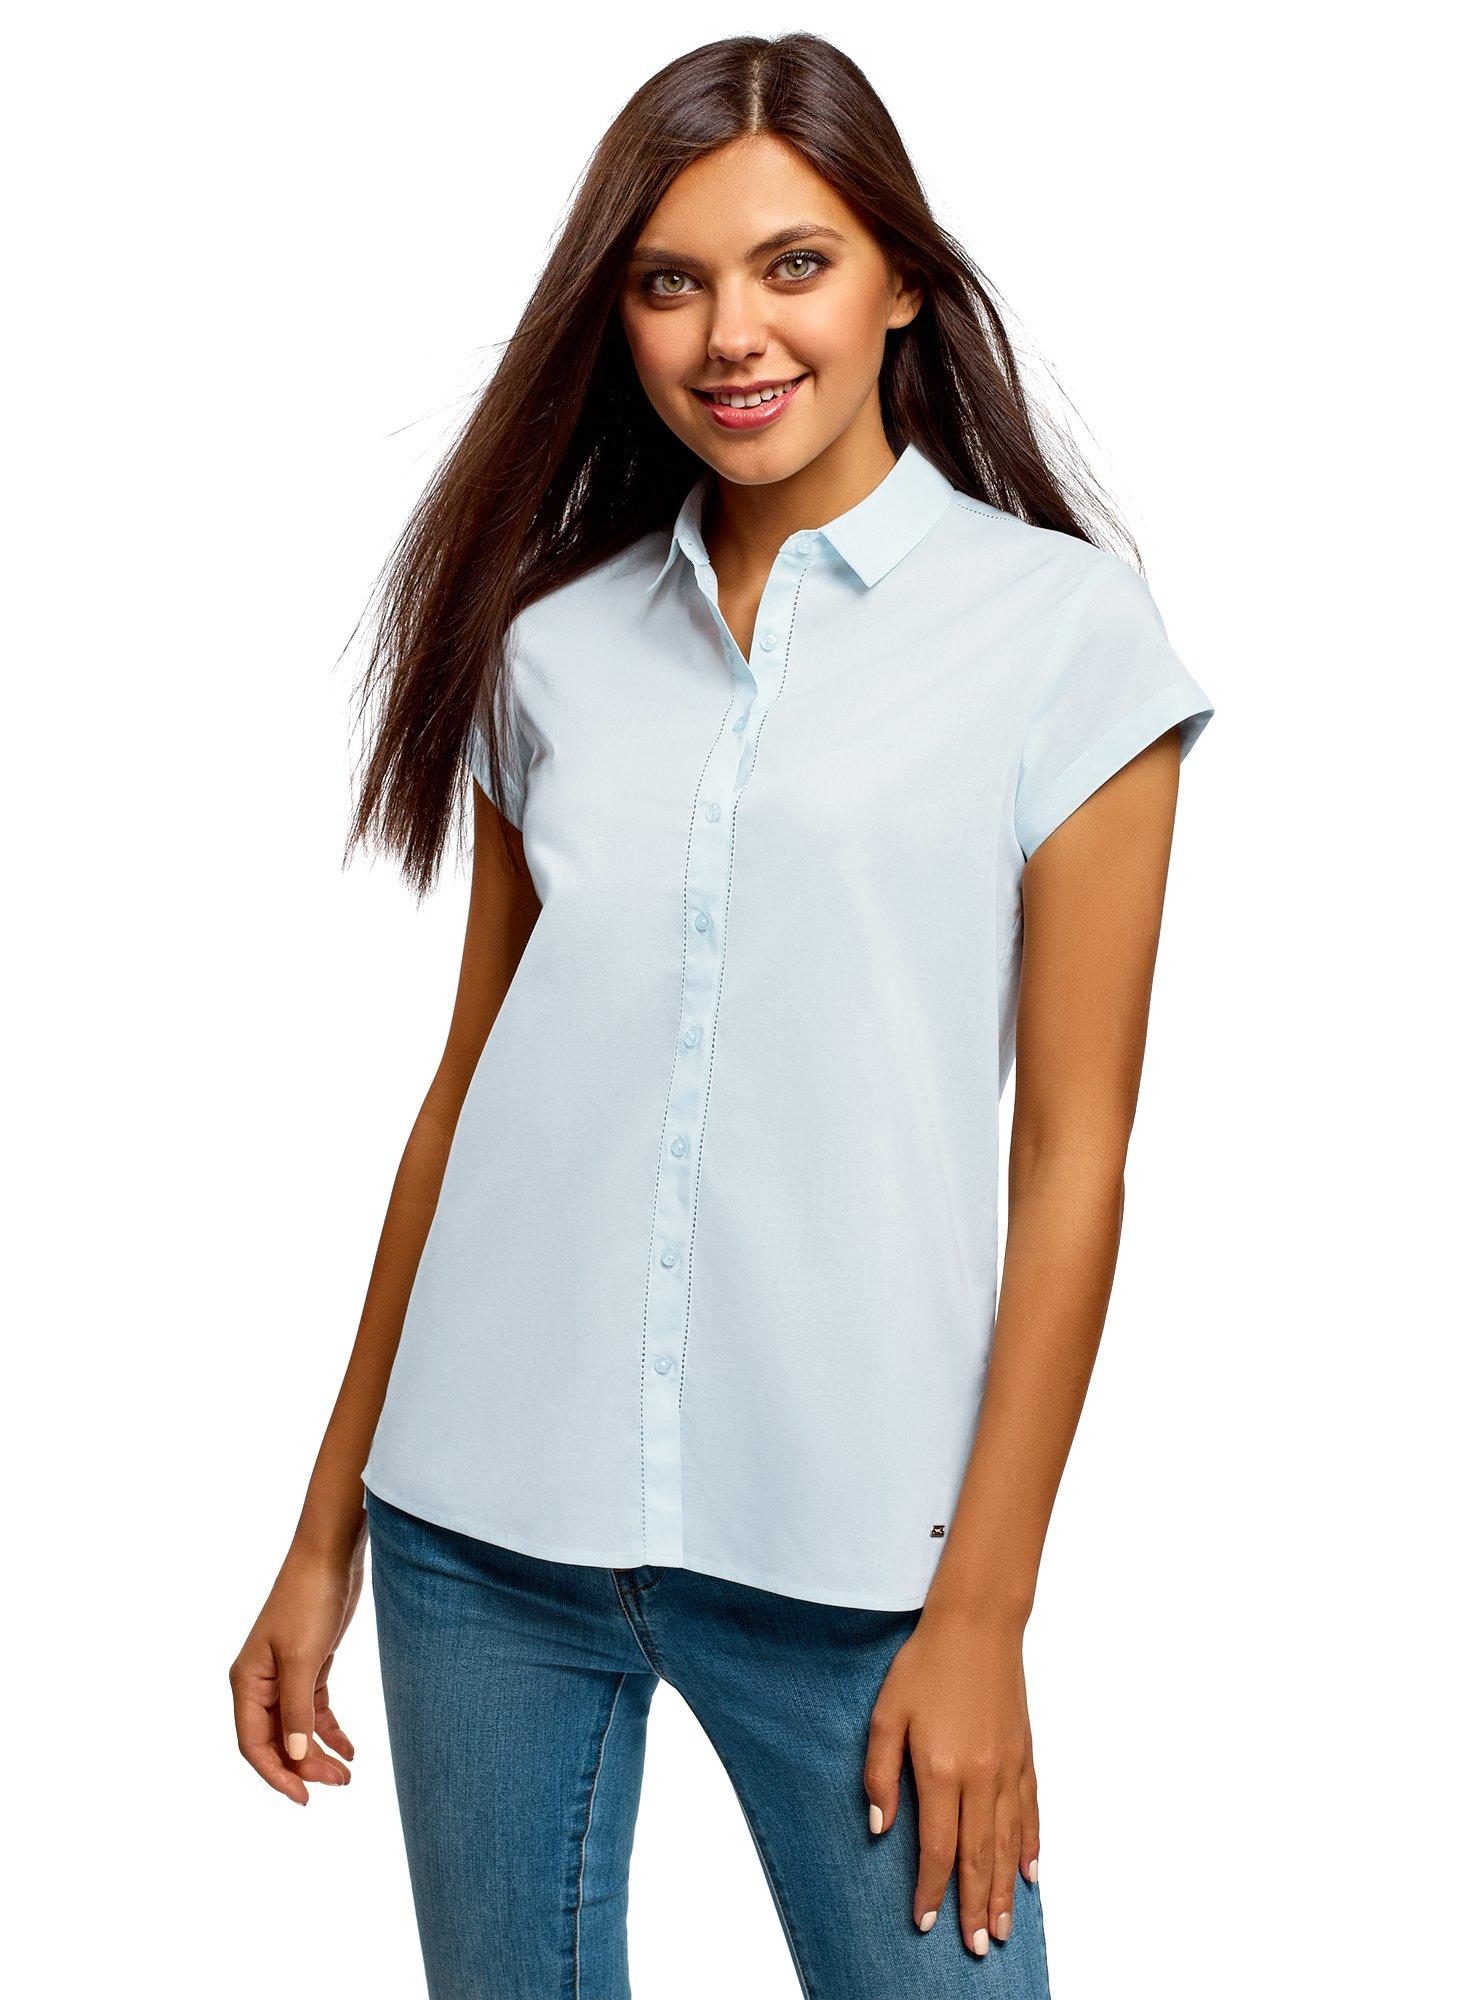 oodji Ultra Women's Short Sleeve Cotton Shirt with Turn-Ups, Blue, 2